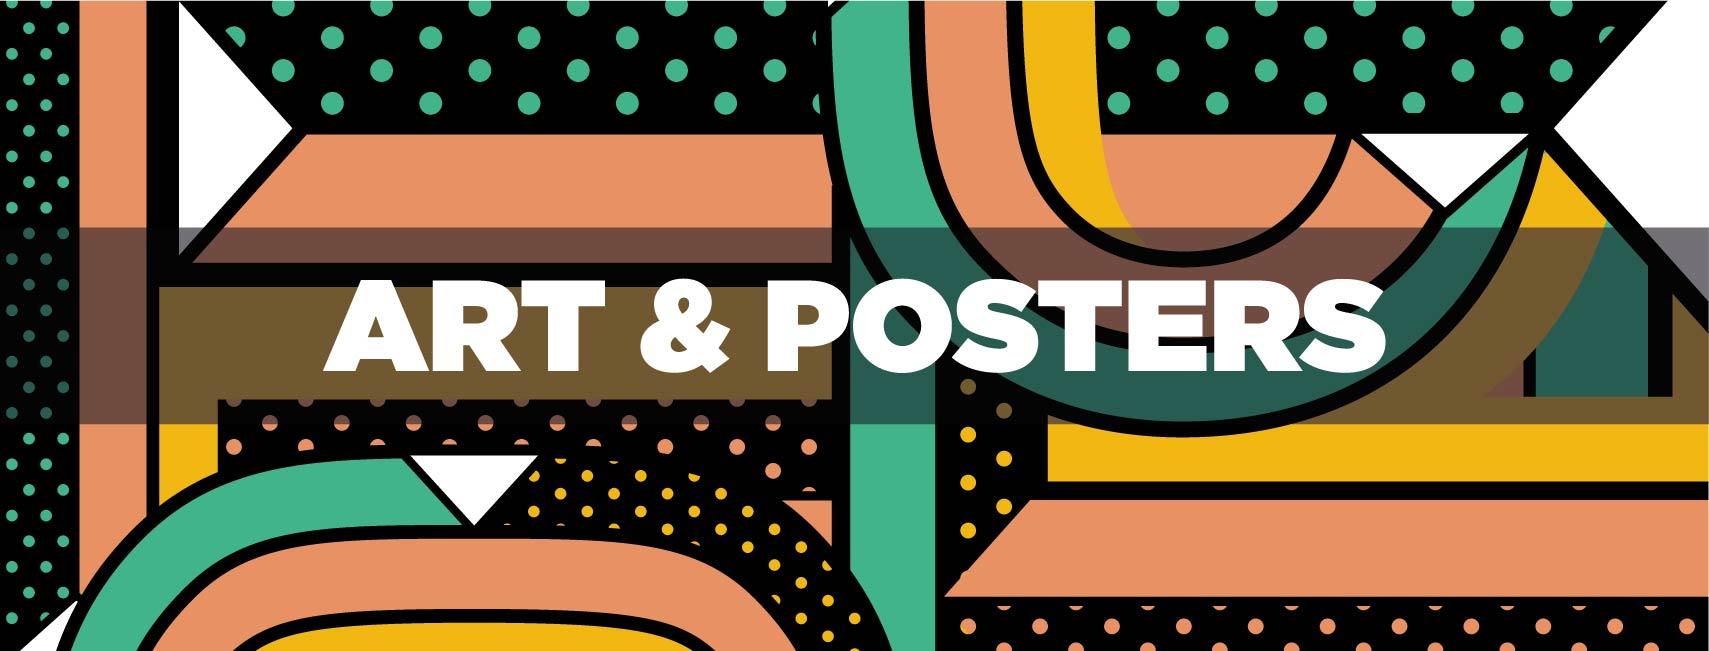 arts & posters banner-01.jpg